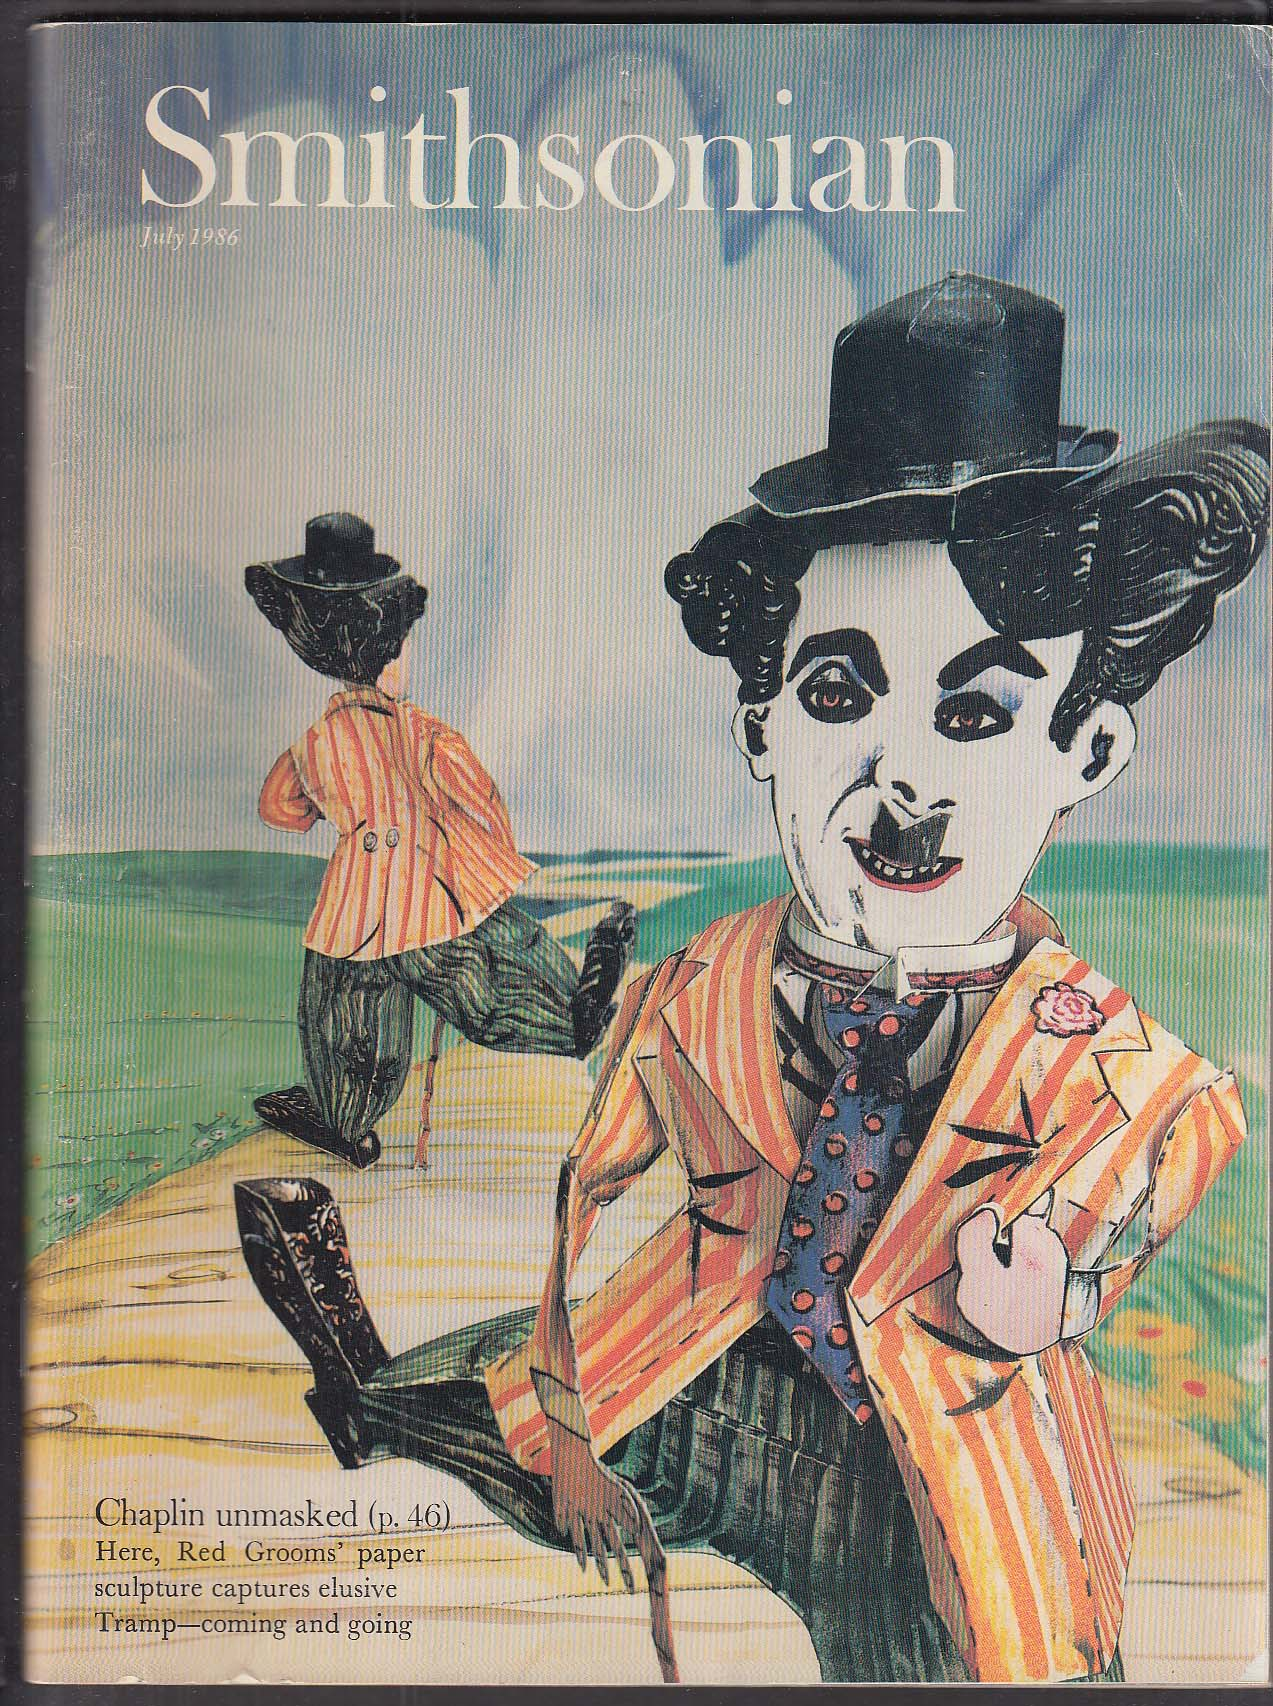 SMITHSONIAN Charlie Chaplin Peggy Guggenheim 7 1986